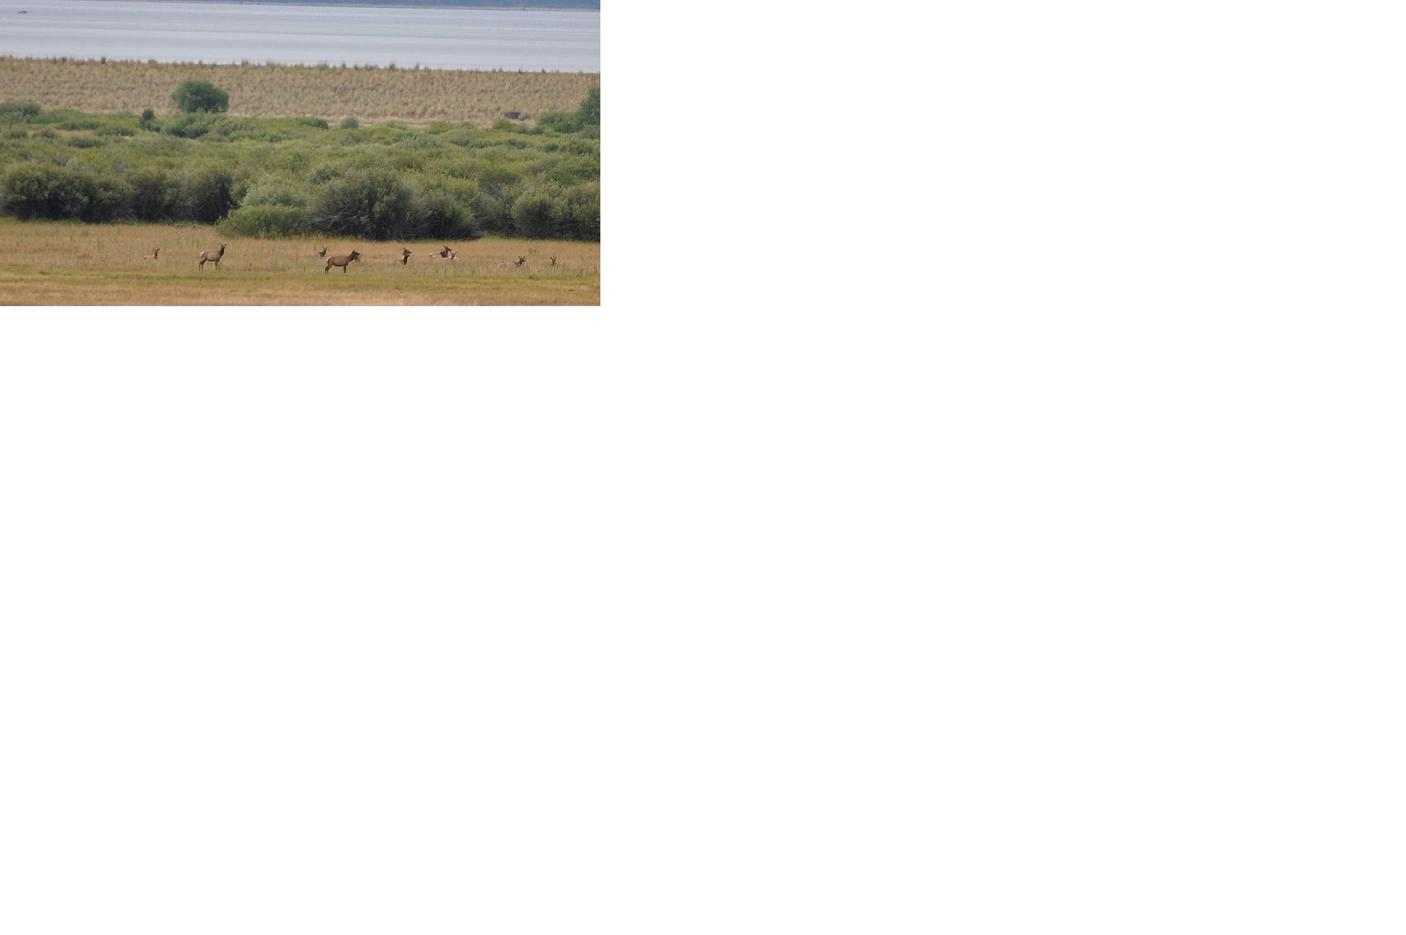 Click image for larger version  Name:elk.JPG Views:148 Size:45.3 KB ID:1864